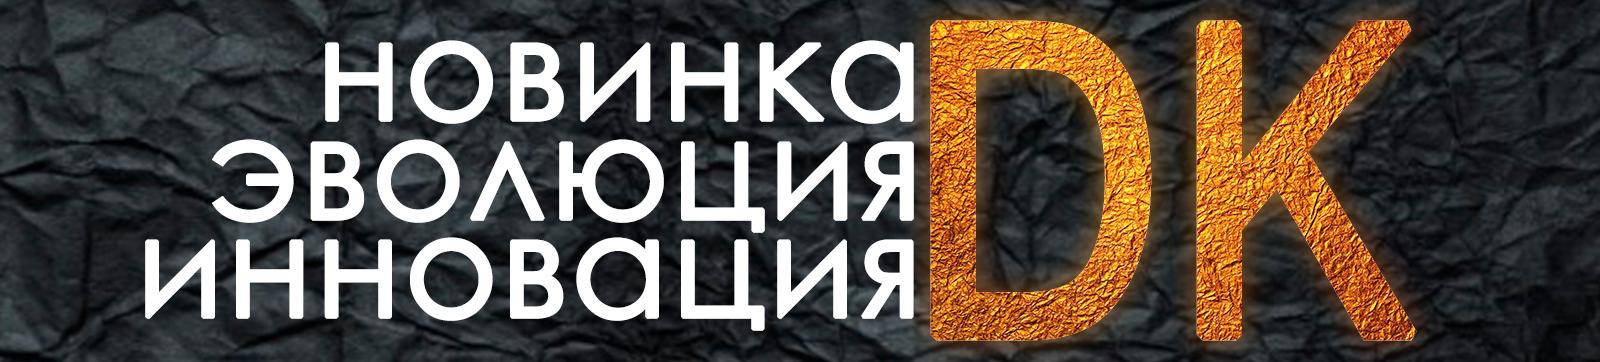 http://flagman-spb.ru/naduvnyie-lodki/dvuhkorpusnyie-naduvnyie-lodki-flagman